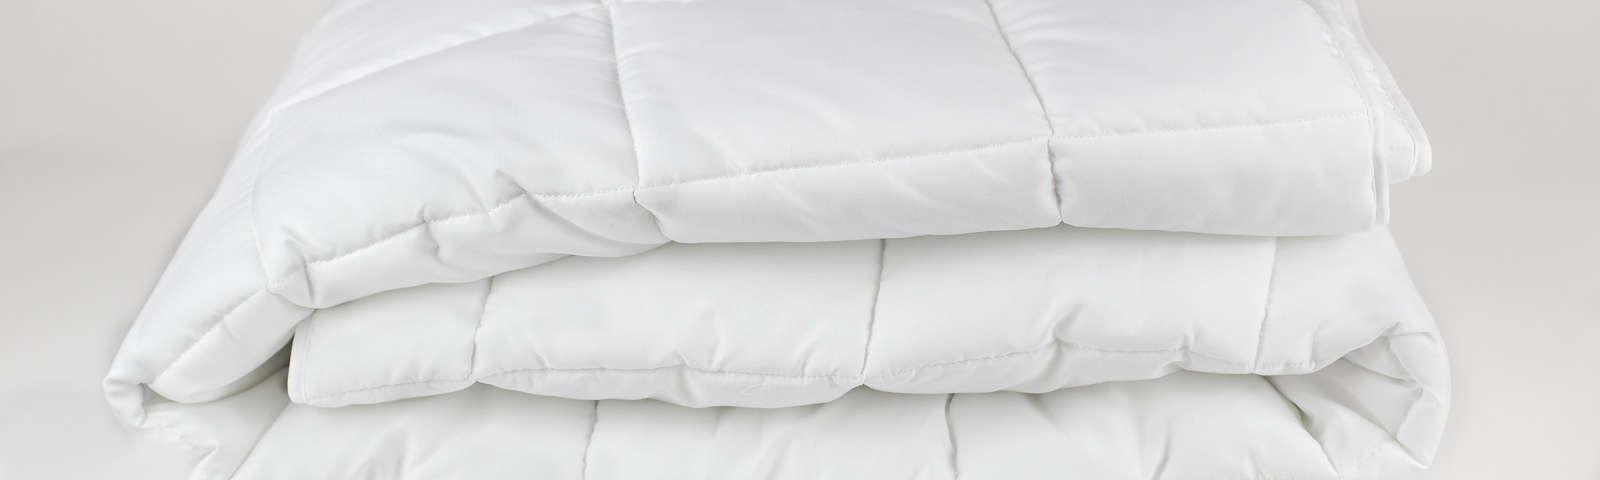 одеяло зимнее фото